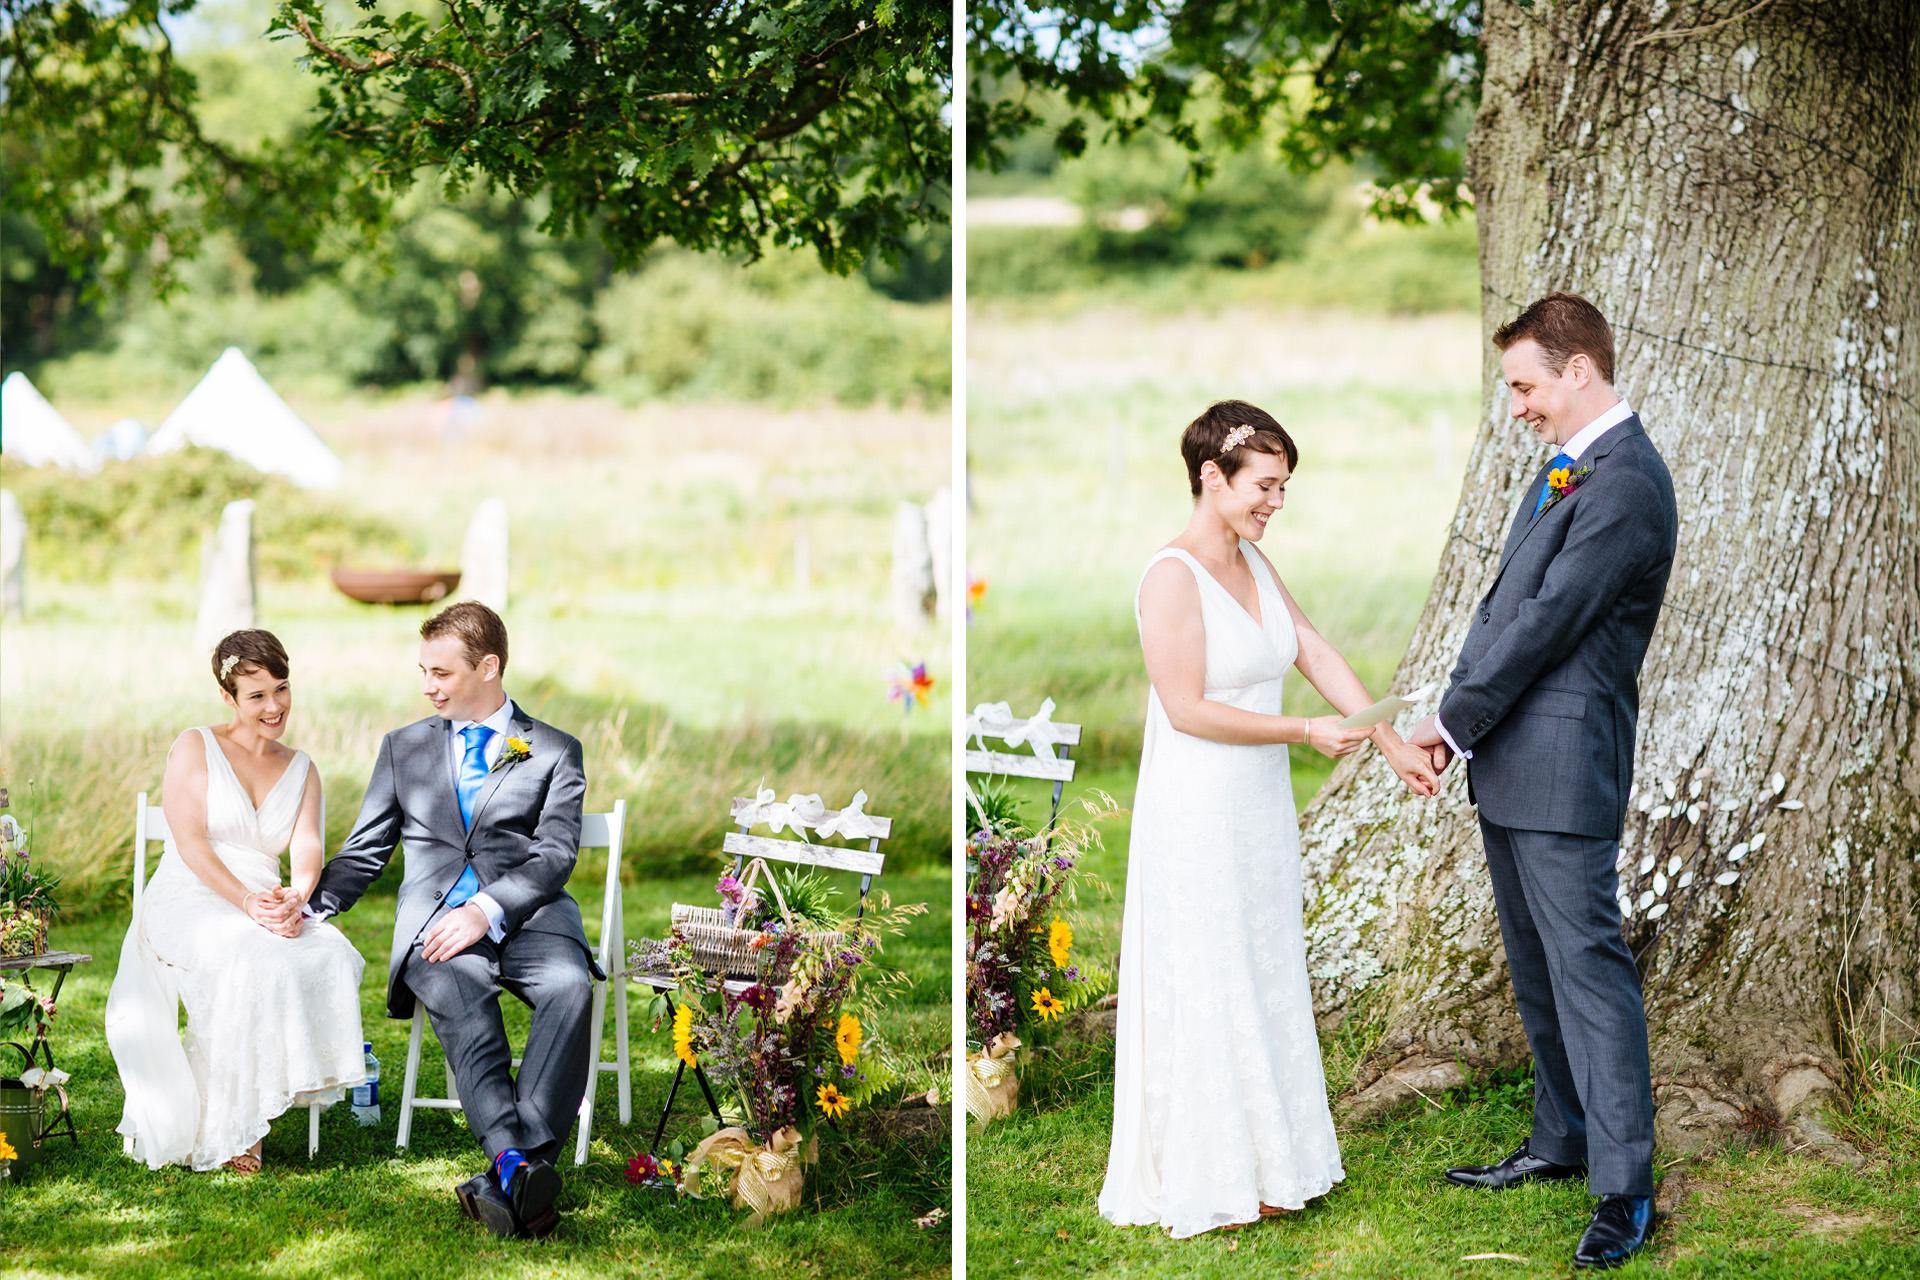 wedding vows underneath a tree